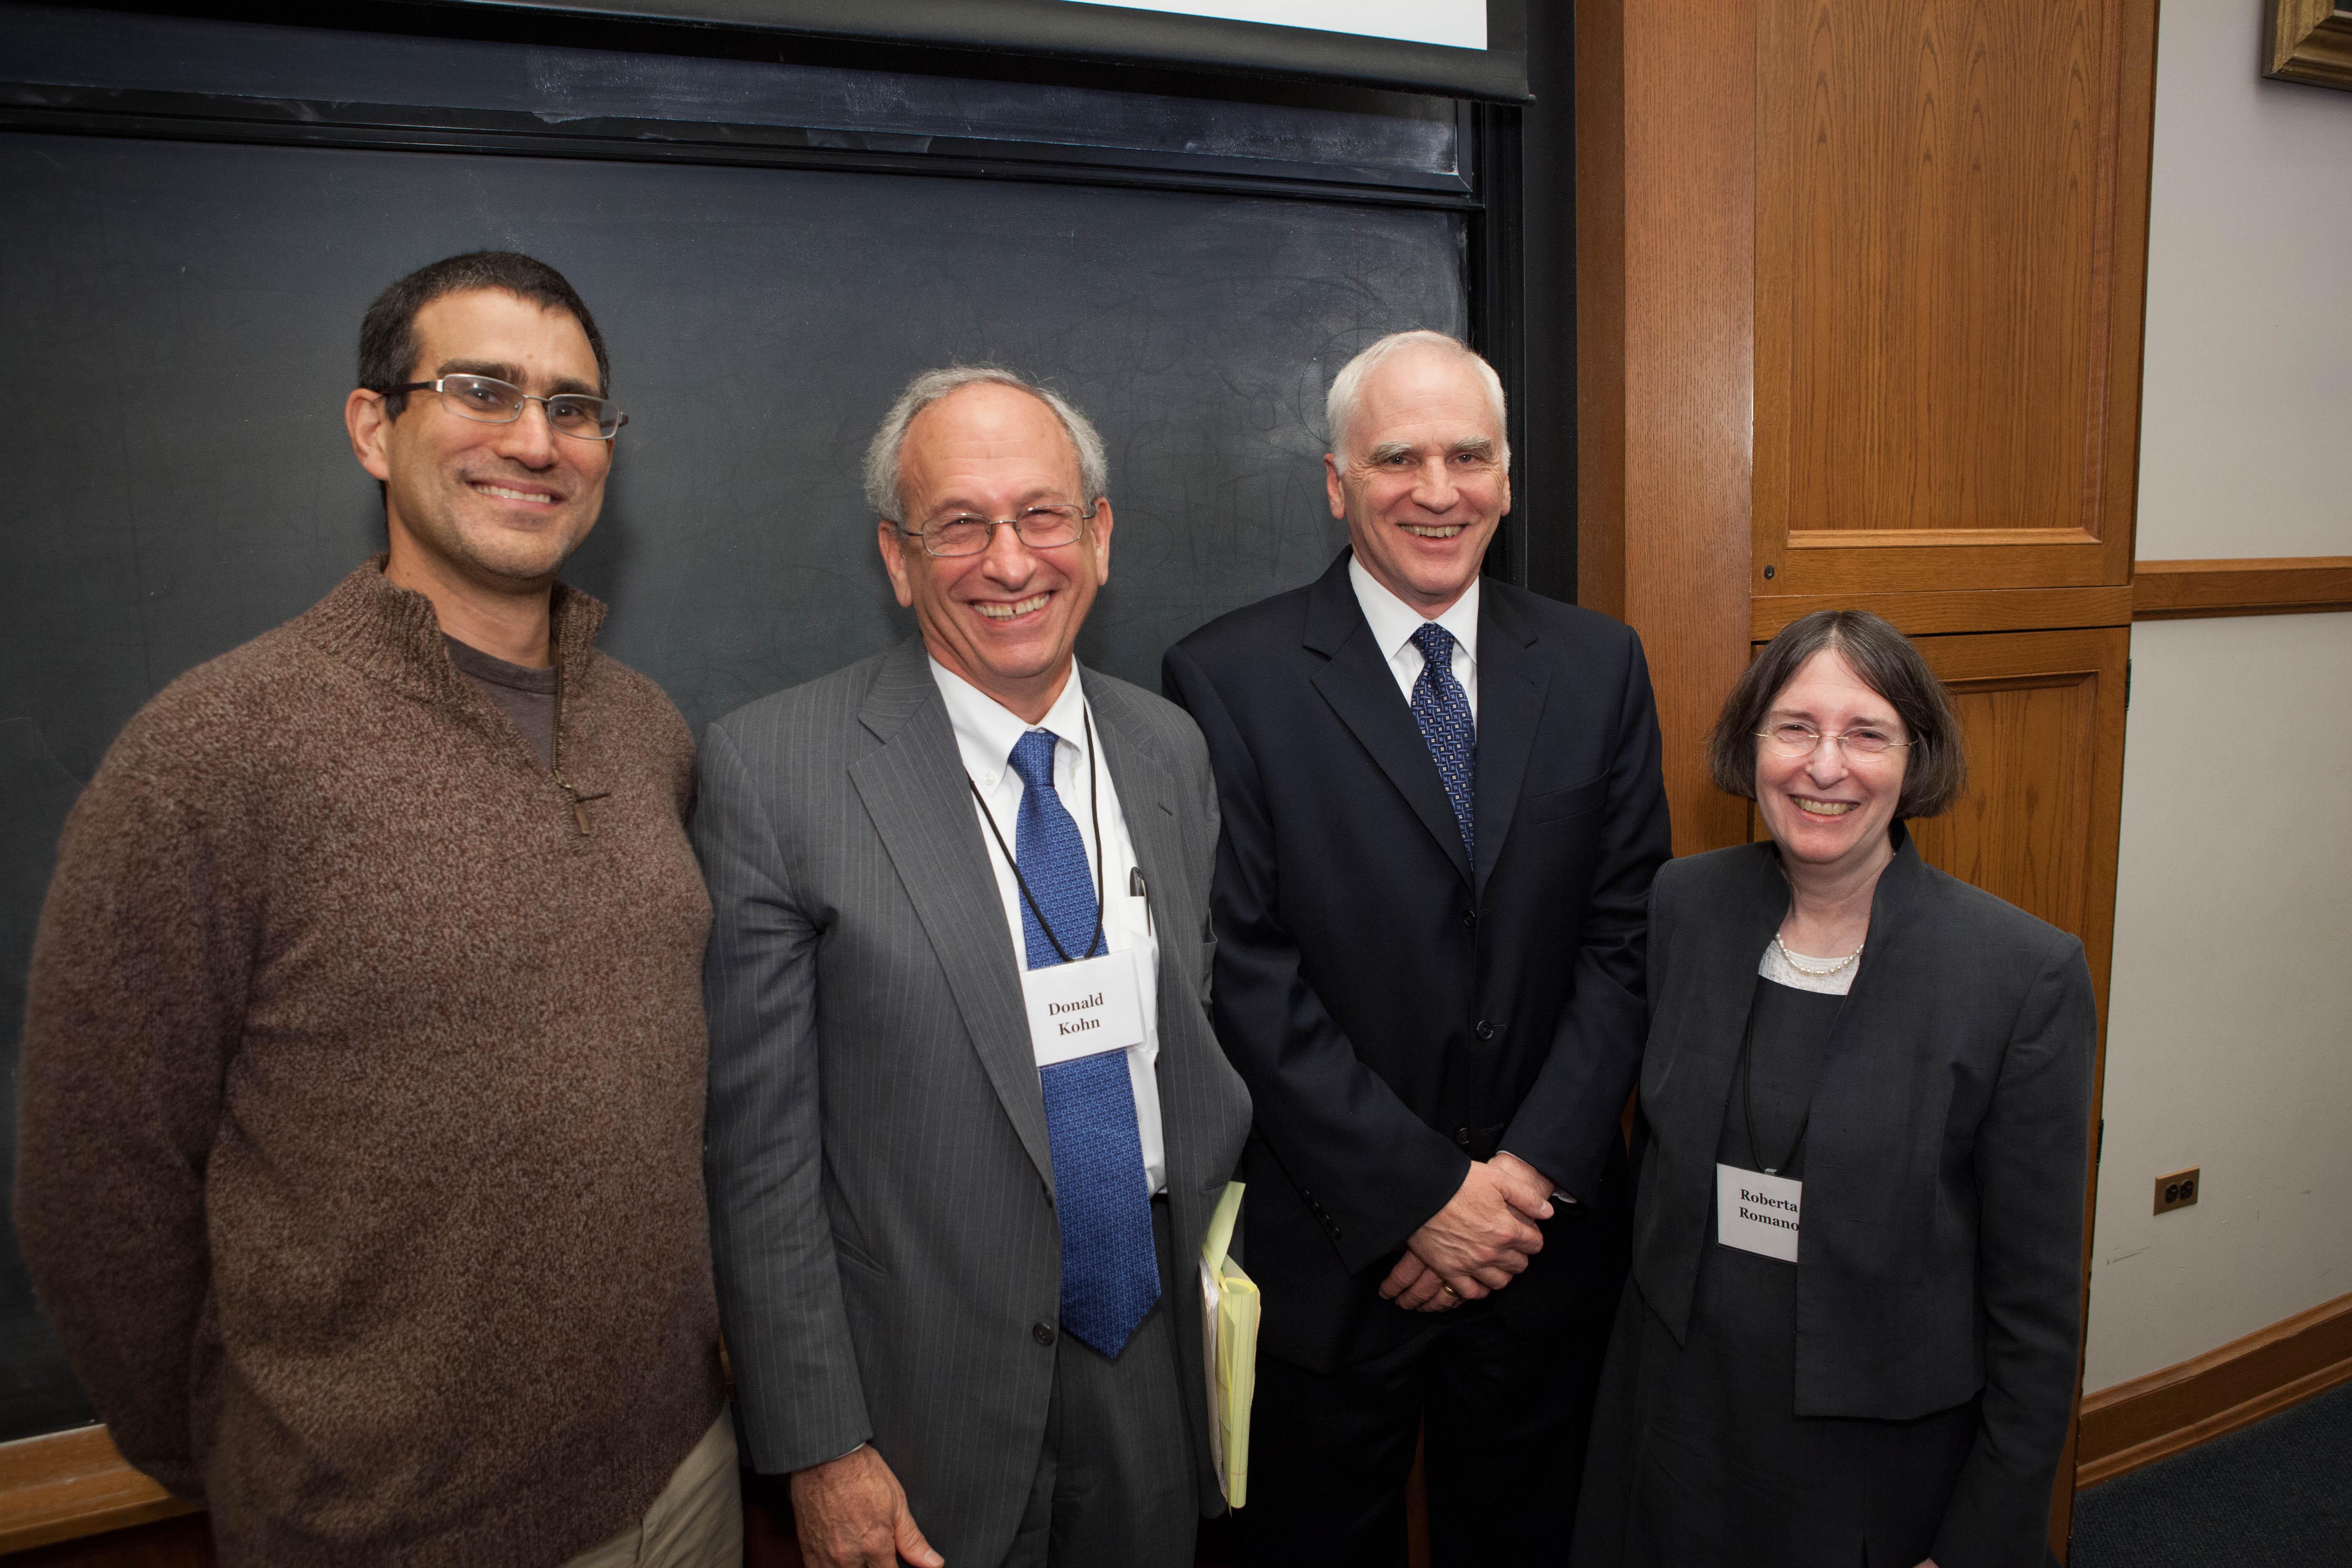 Yale SOM Prof. Andrew Metrick, Donald Kohn, Fed. Res. Bd. Gov. Daniel K. Tarullo, YLS Prof. and Center Dir. Roberta Romano '80